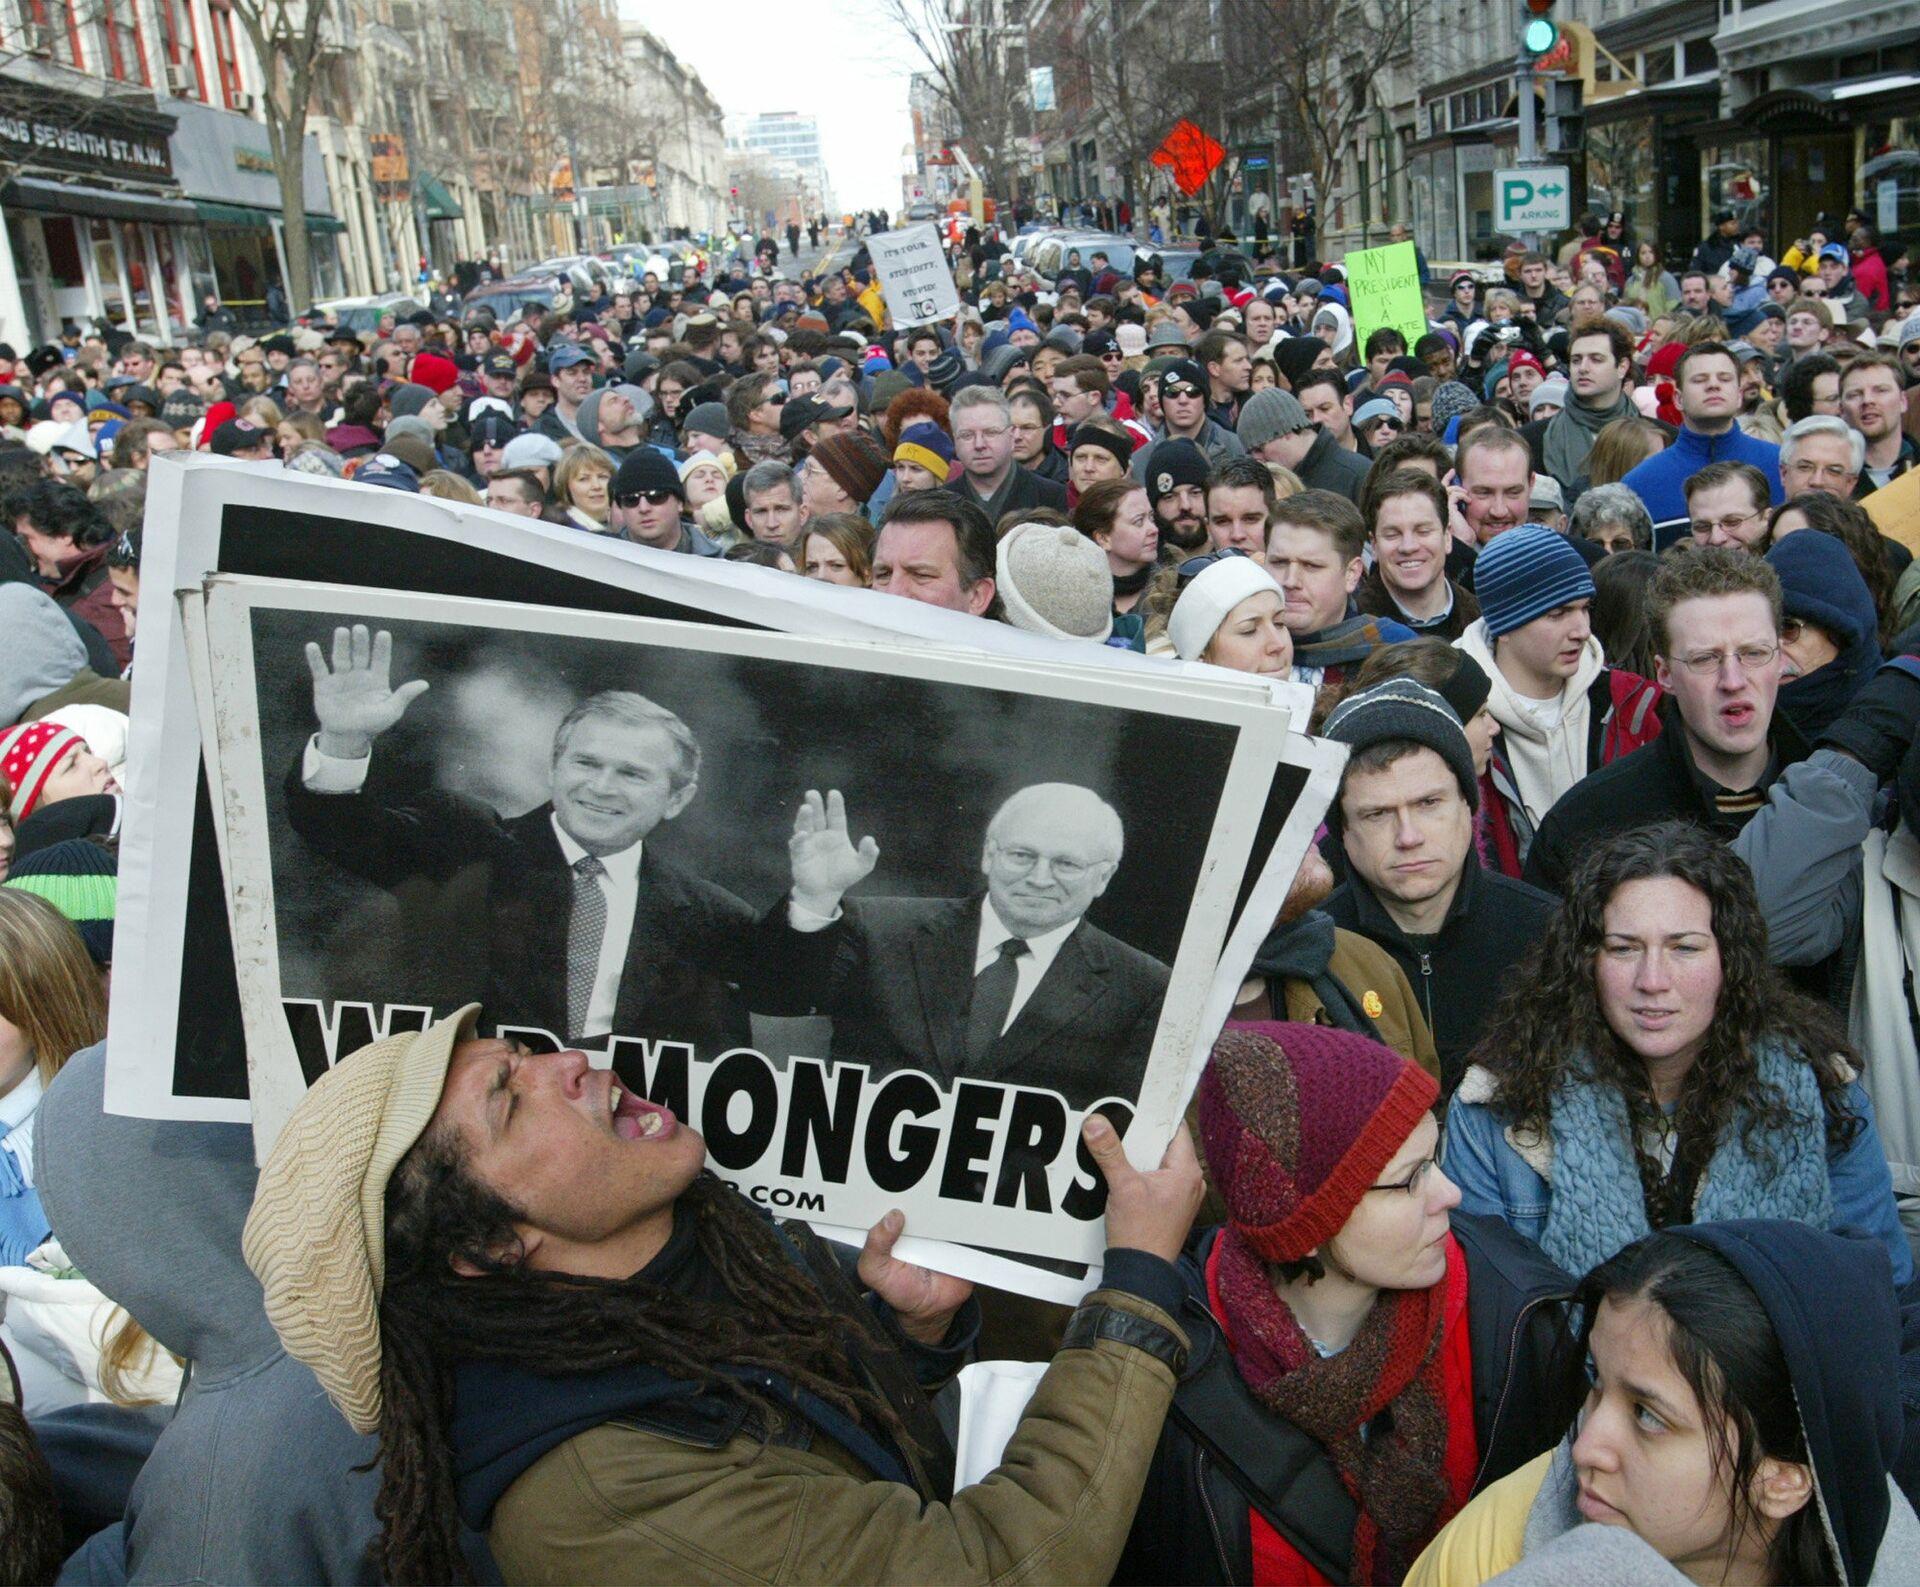 Акция протеста в день инаугурации президента США Джорджа Буша-младшего, 2005 год - РИА Новости, 1920, 15.09.2020